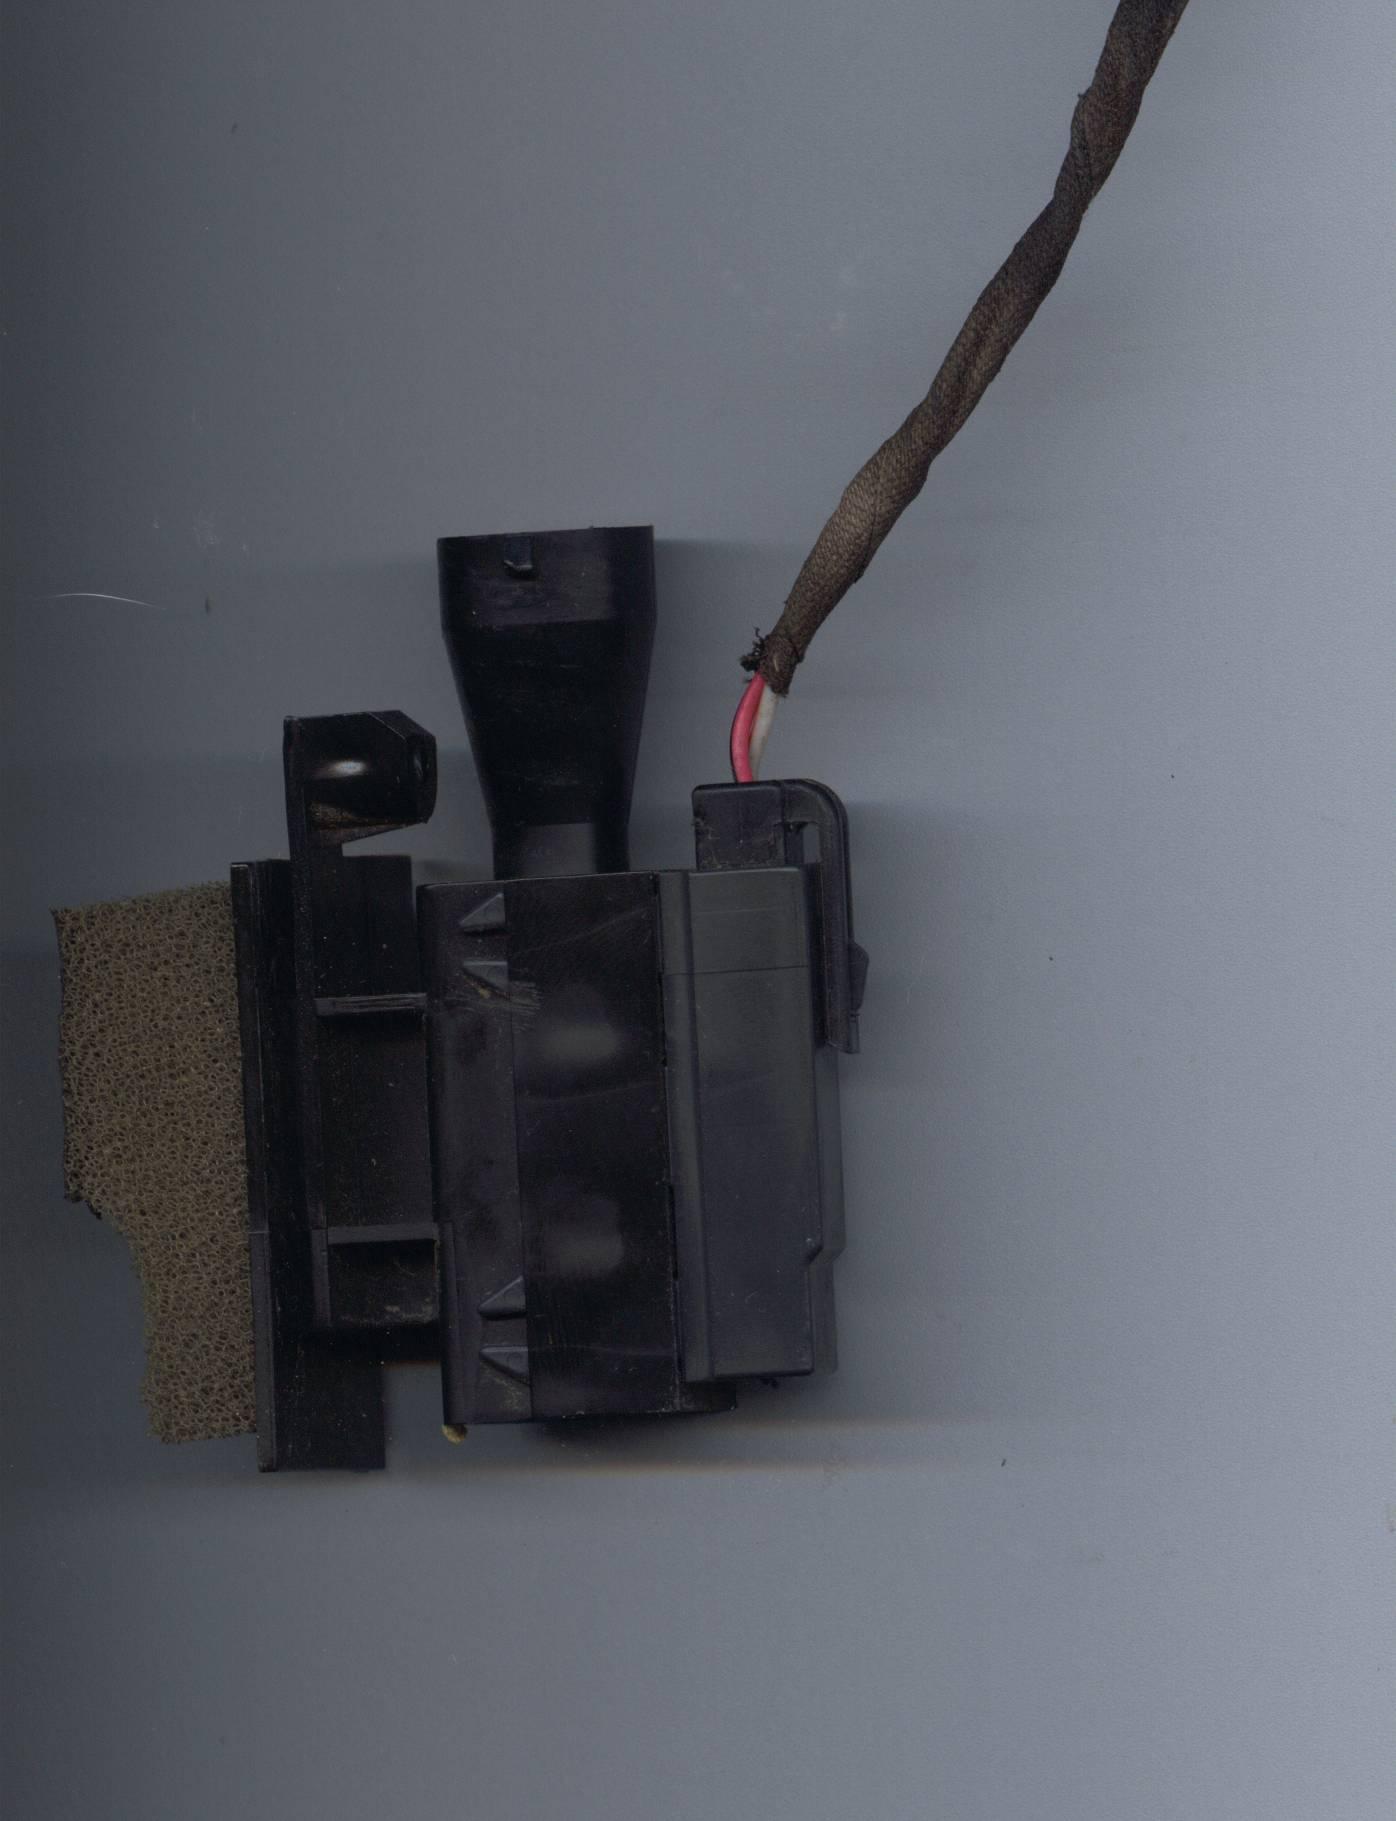 Ford EATC (Electronic Automatic Temperature Control) Retrofit